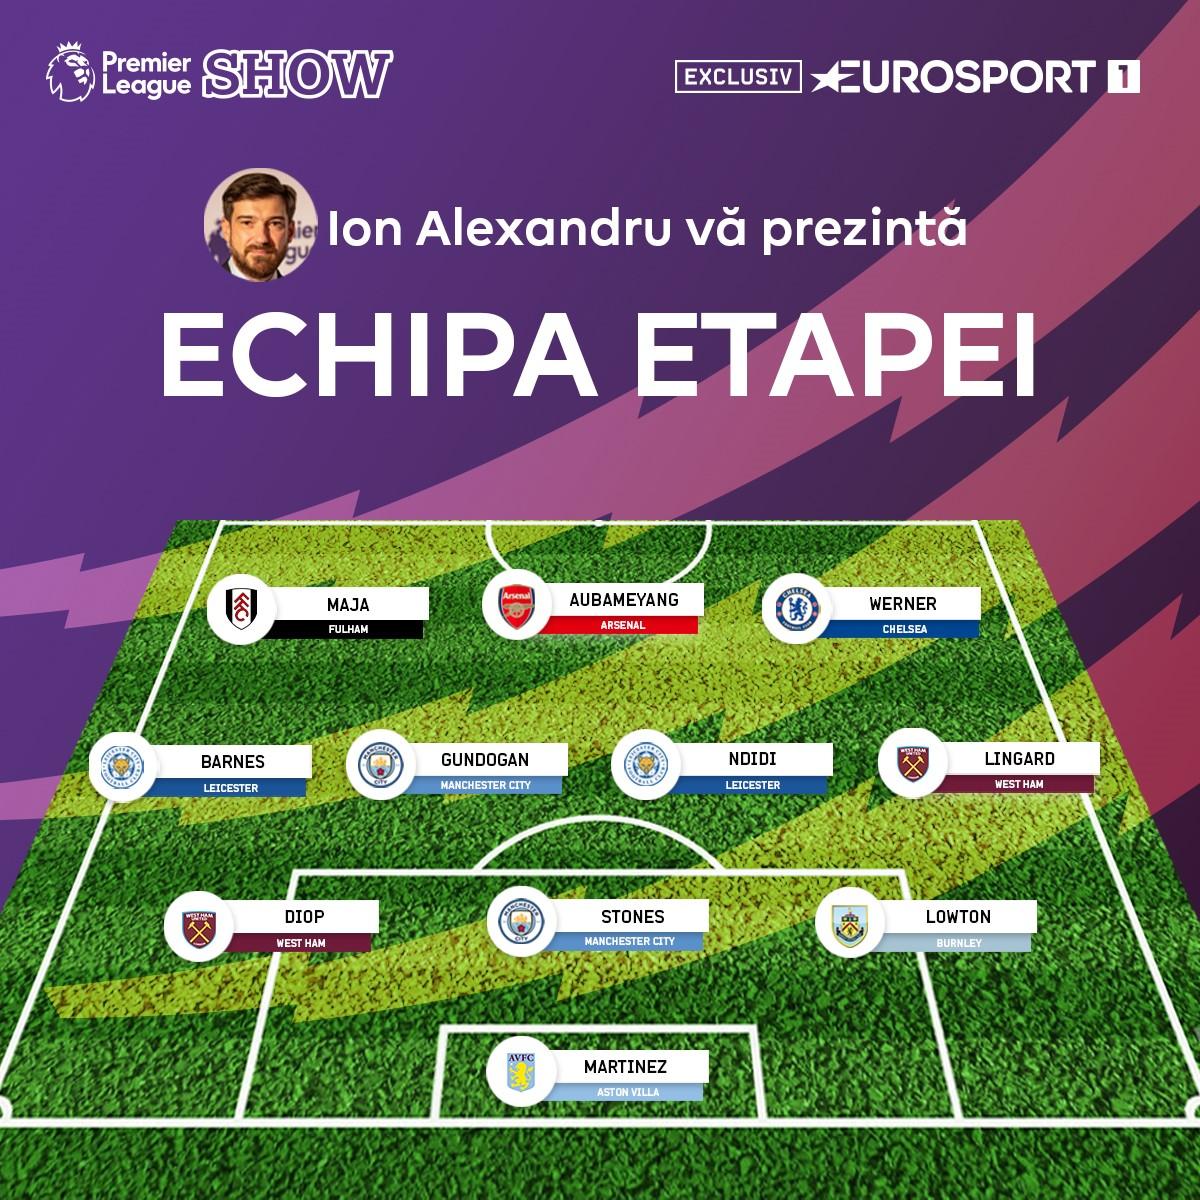 https://i.eurosport.com/2021/02/16/2995708.jpg